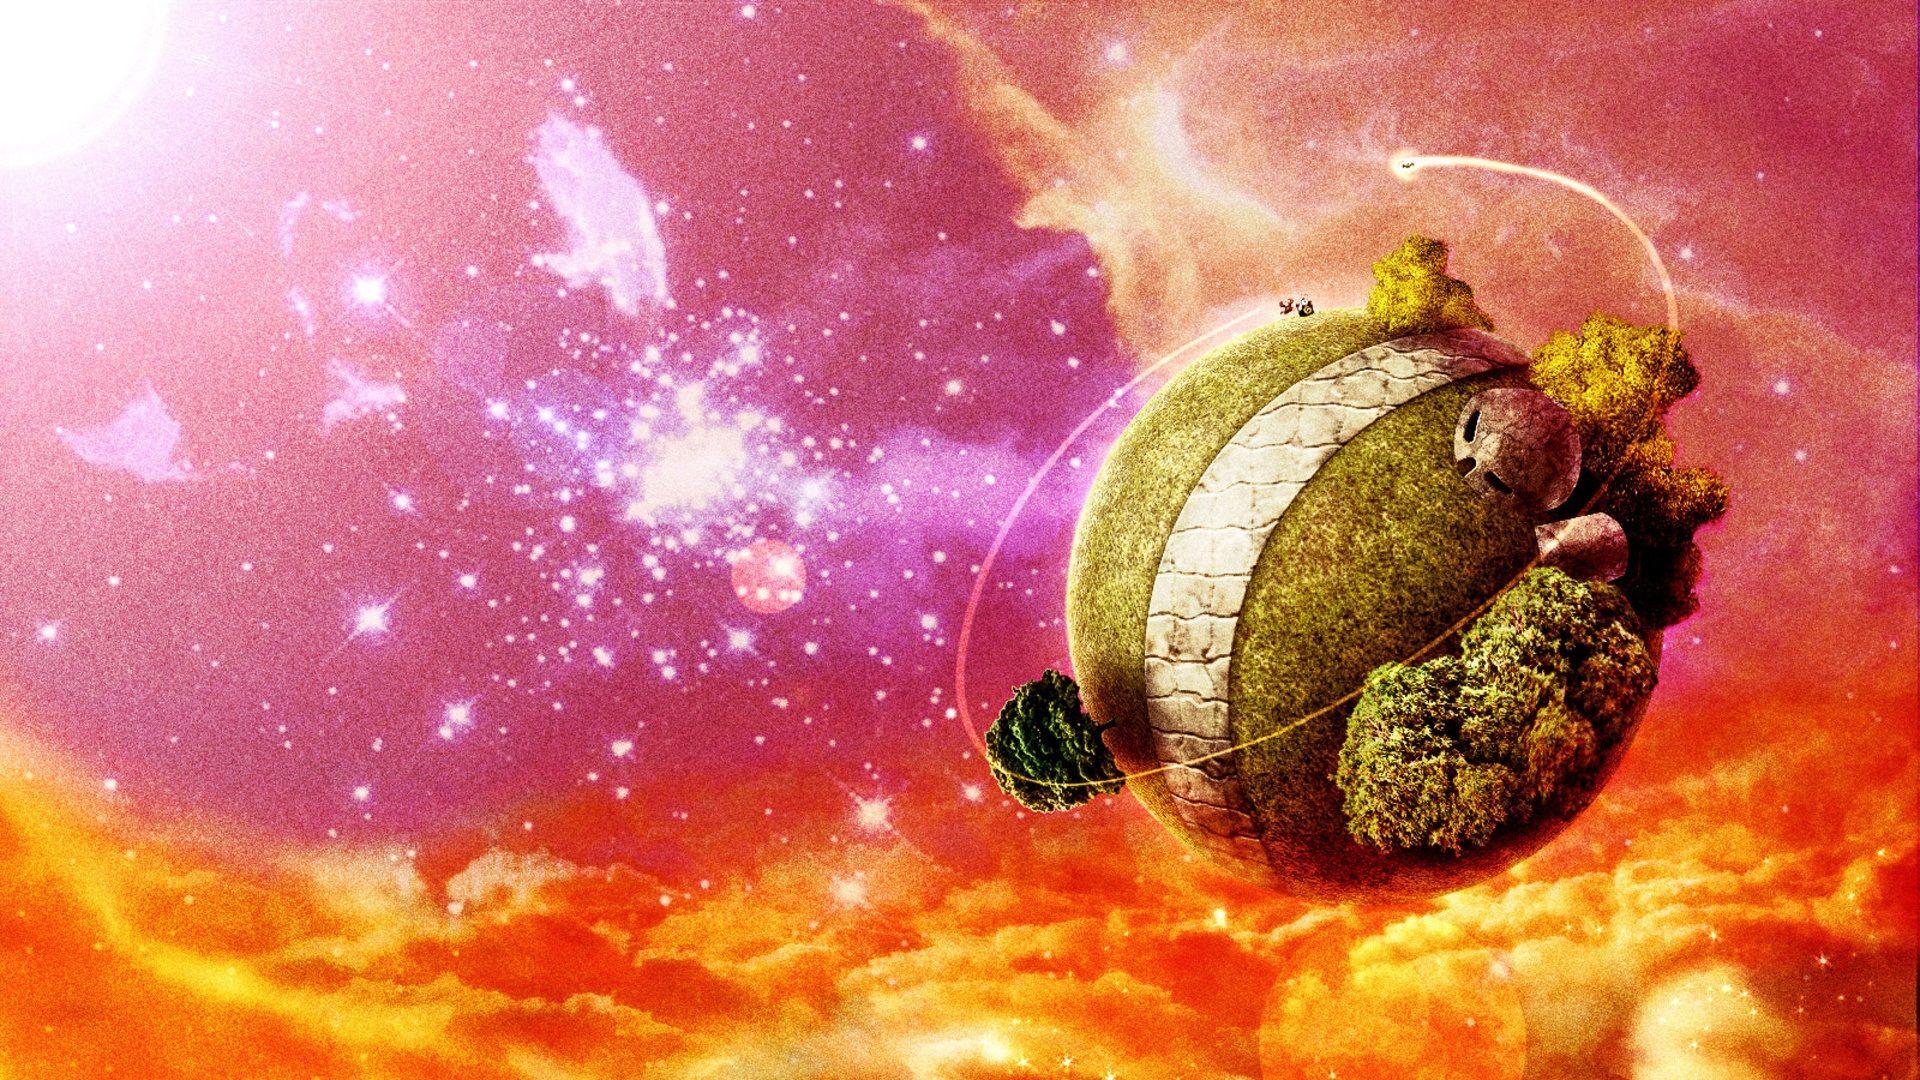 Hd wallpaper dragon - Dragon Ball Z Wallpapers Hd Goku Free Download